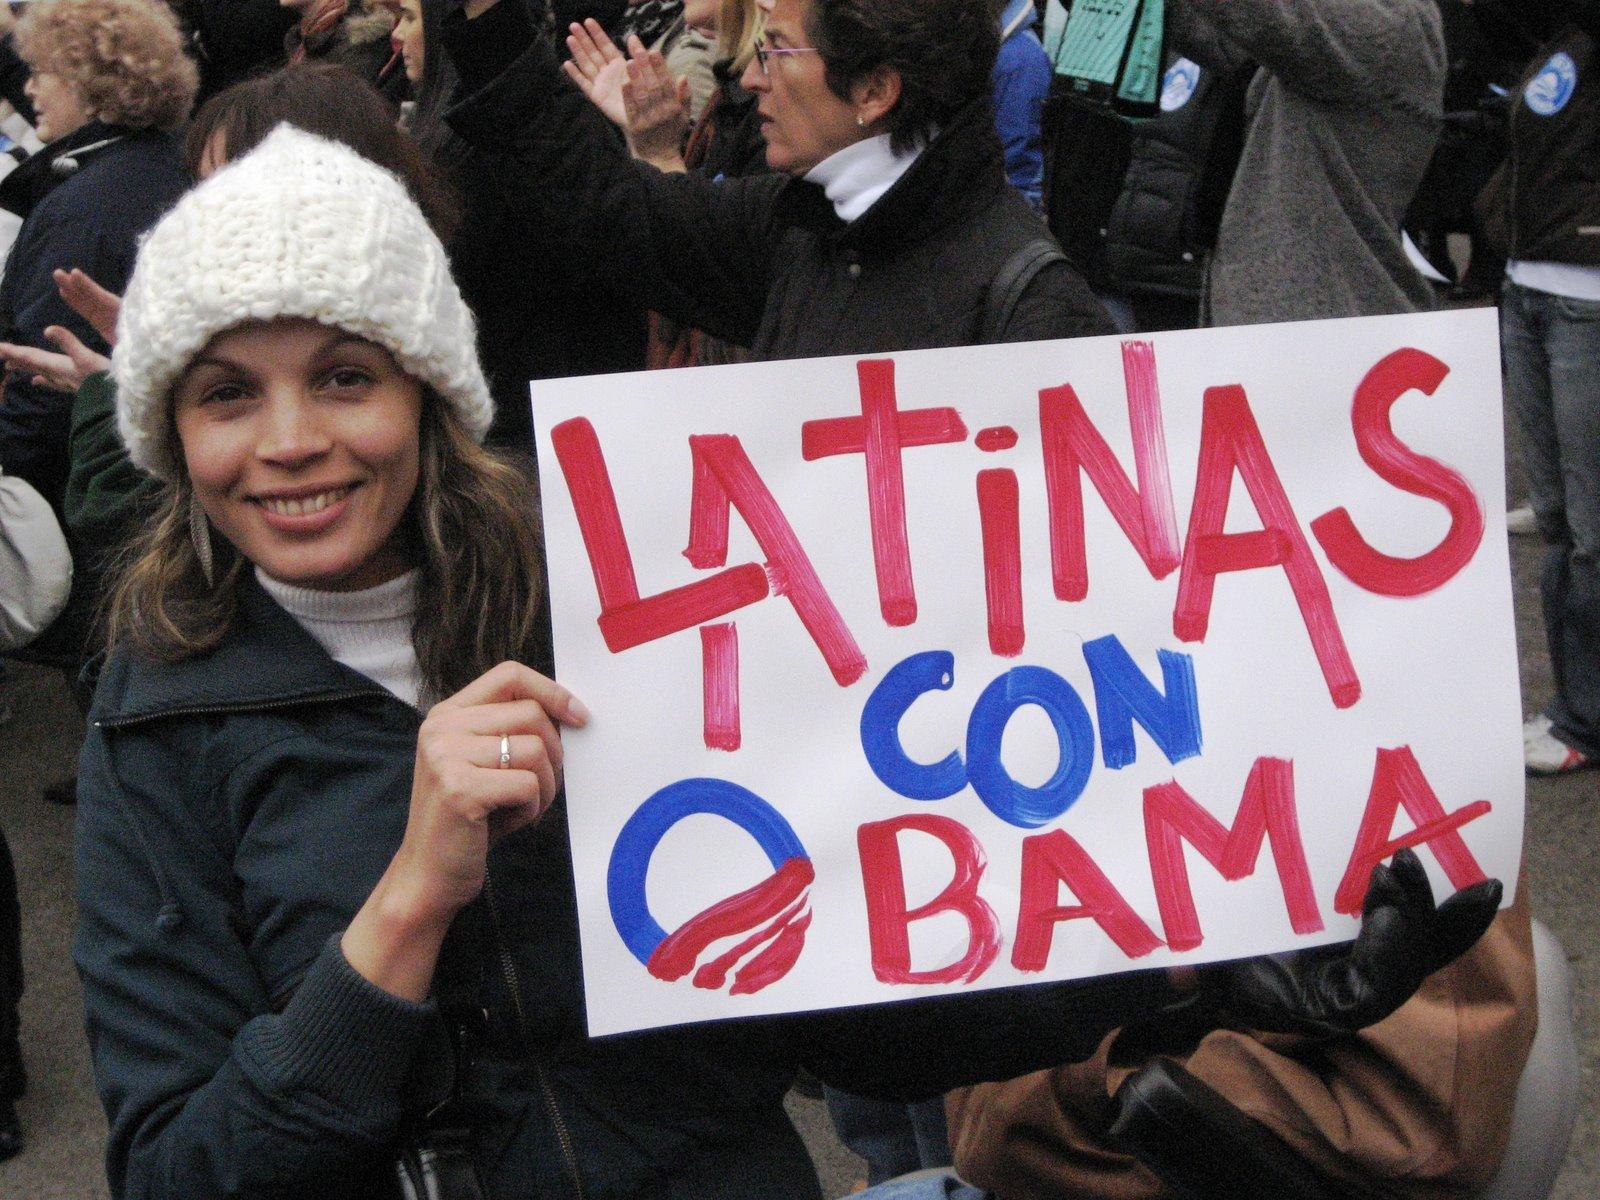 las-vegas-employer-obama-won-so-i-fired-22-employees